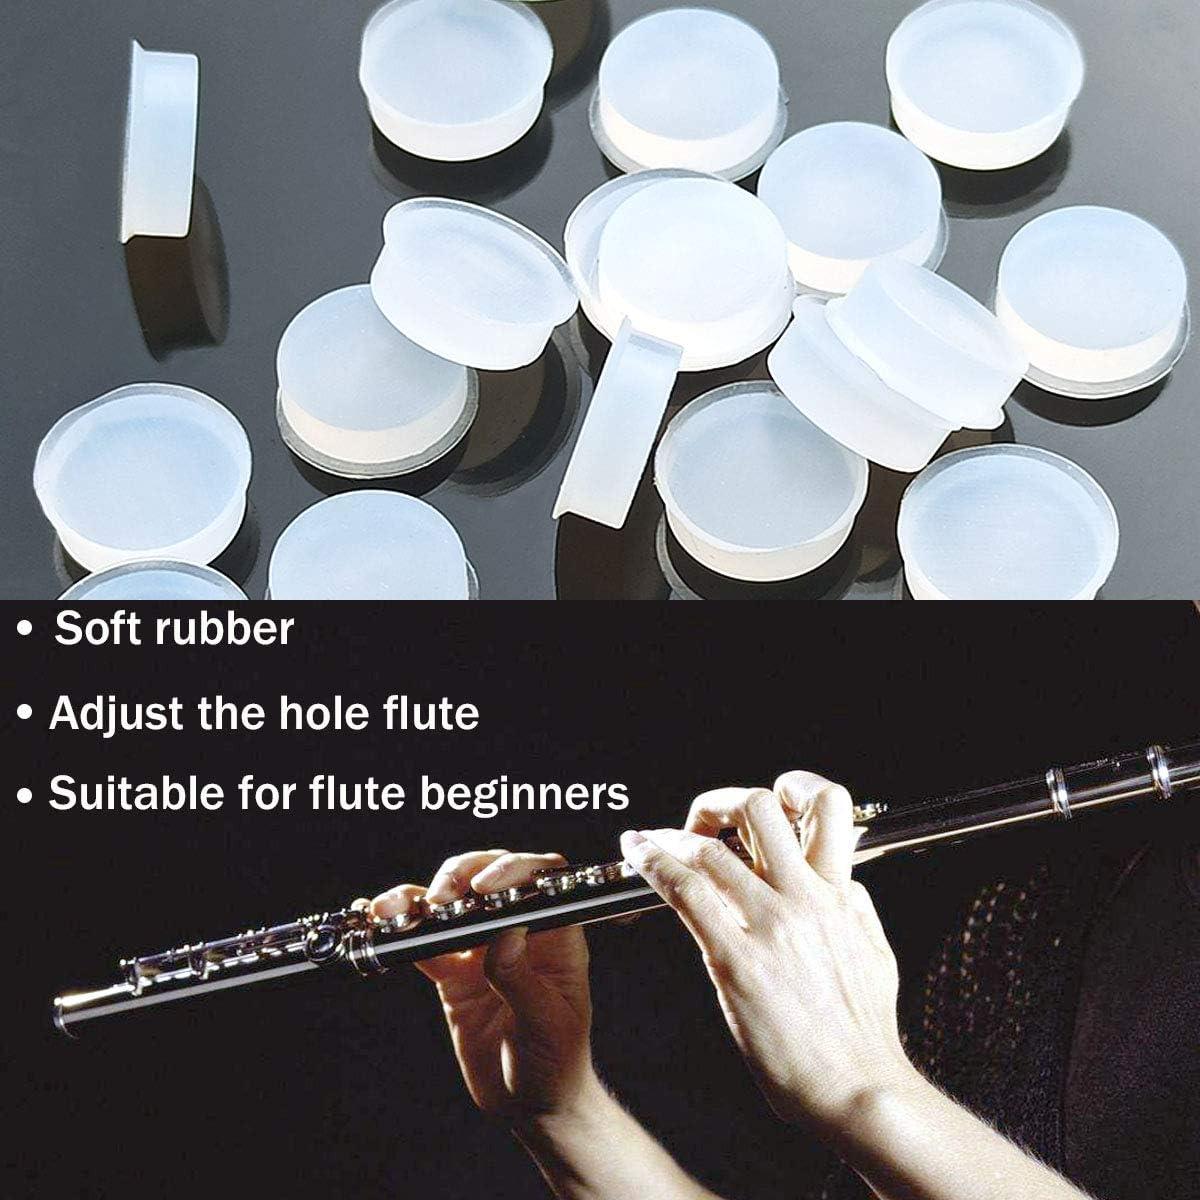 7 X 3mm 20 Pcs Rubber Flute Plugs Silicone Flute Plug Silicone Flute Key Plugs Flute Open Hole Plug Flutes Repair Parts Accessories